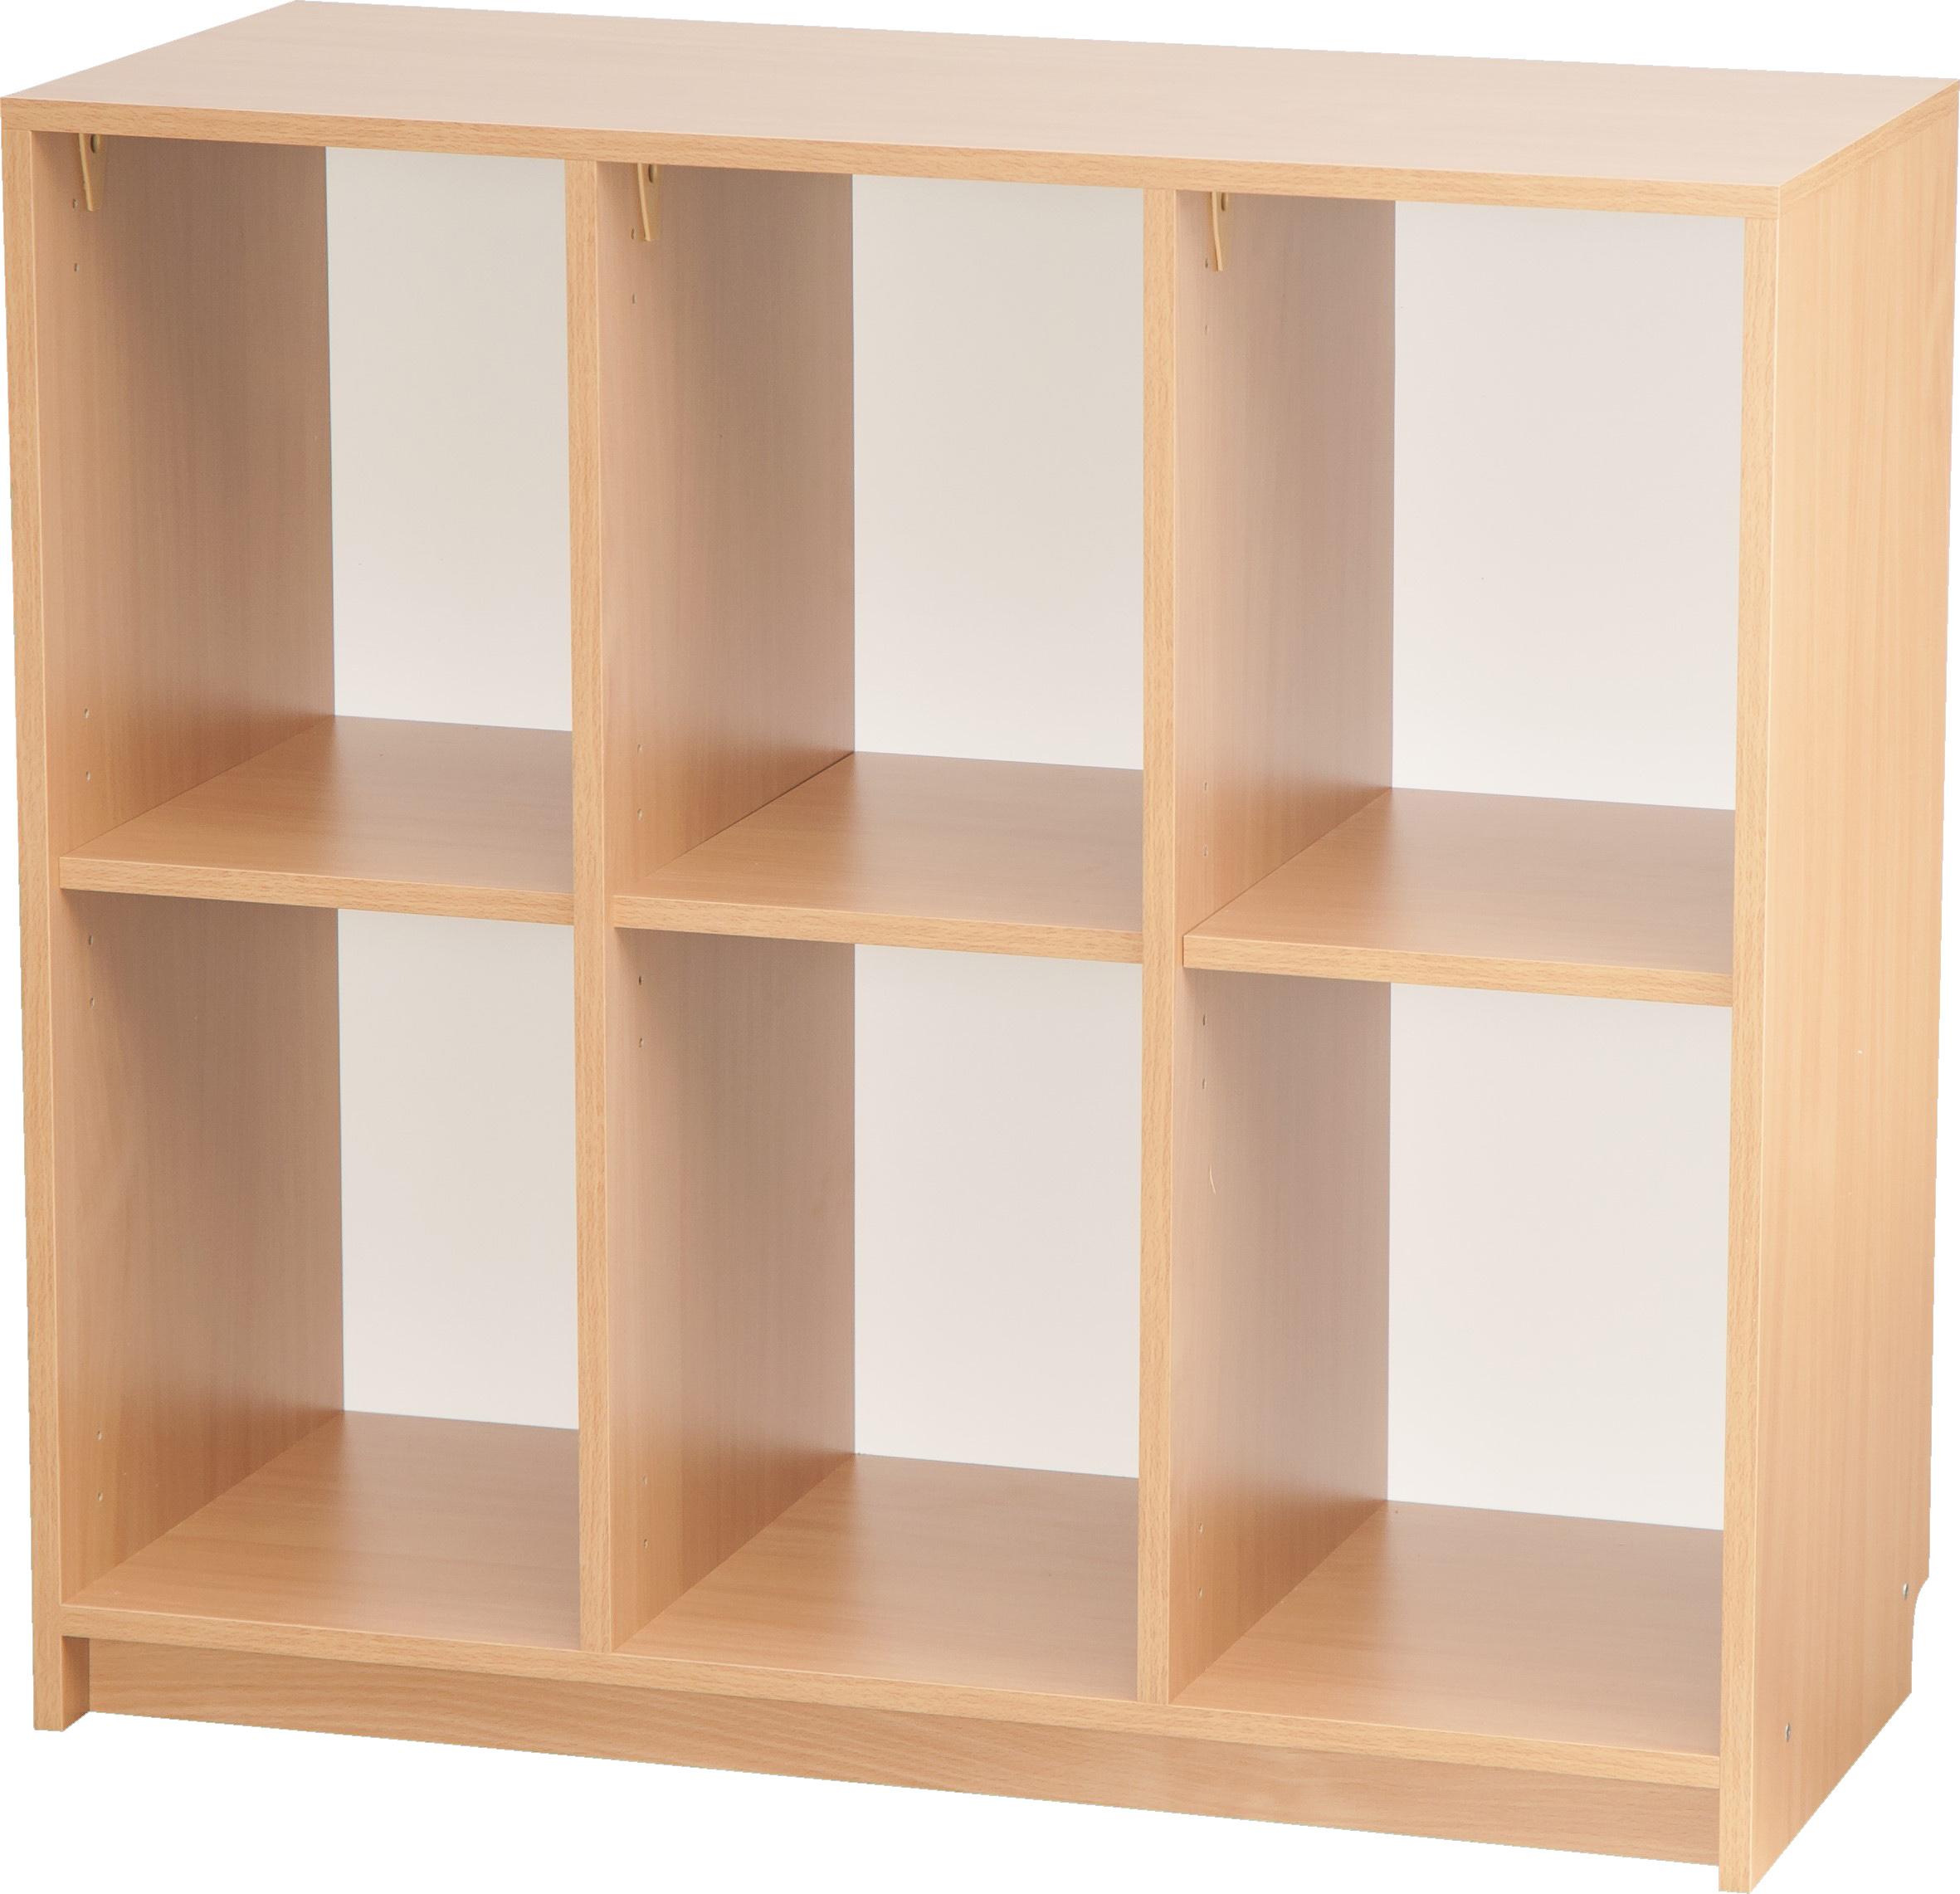 meuble case ikea maison design. Black Bedroom Furniture Sets. Home Design Ideas